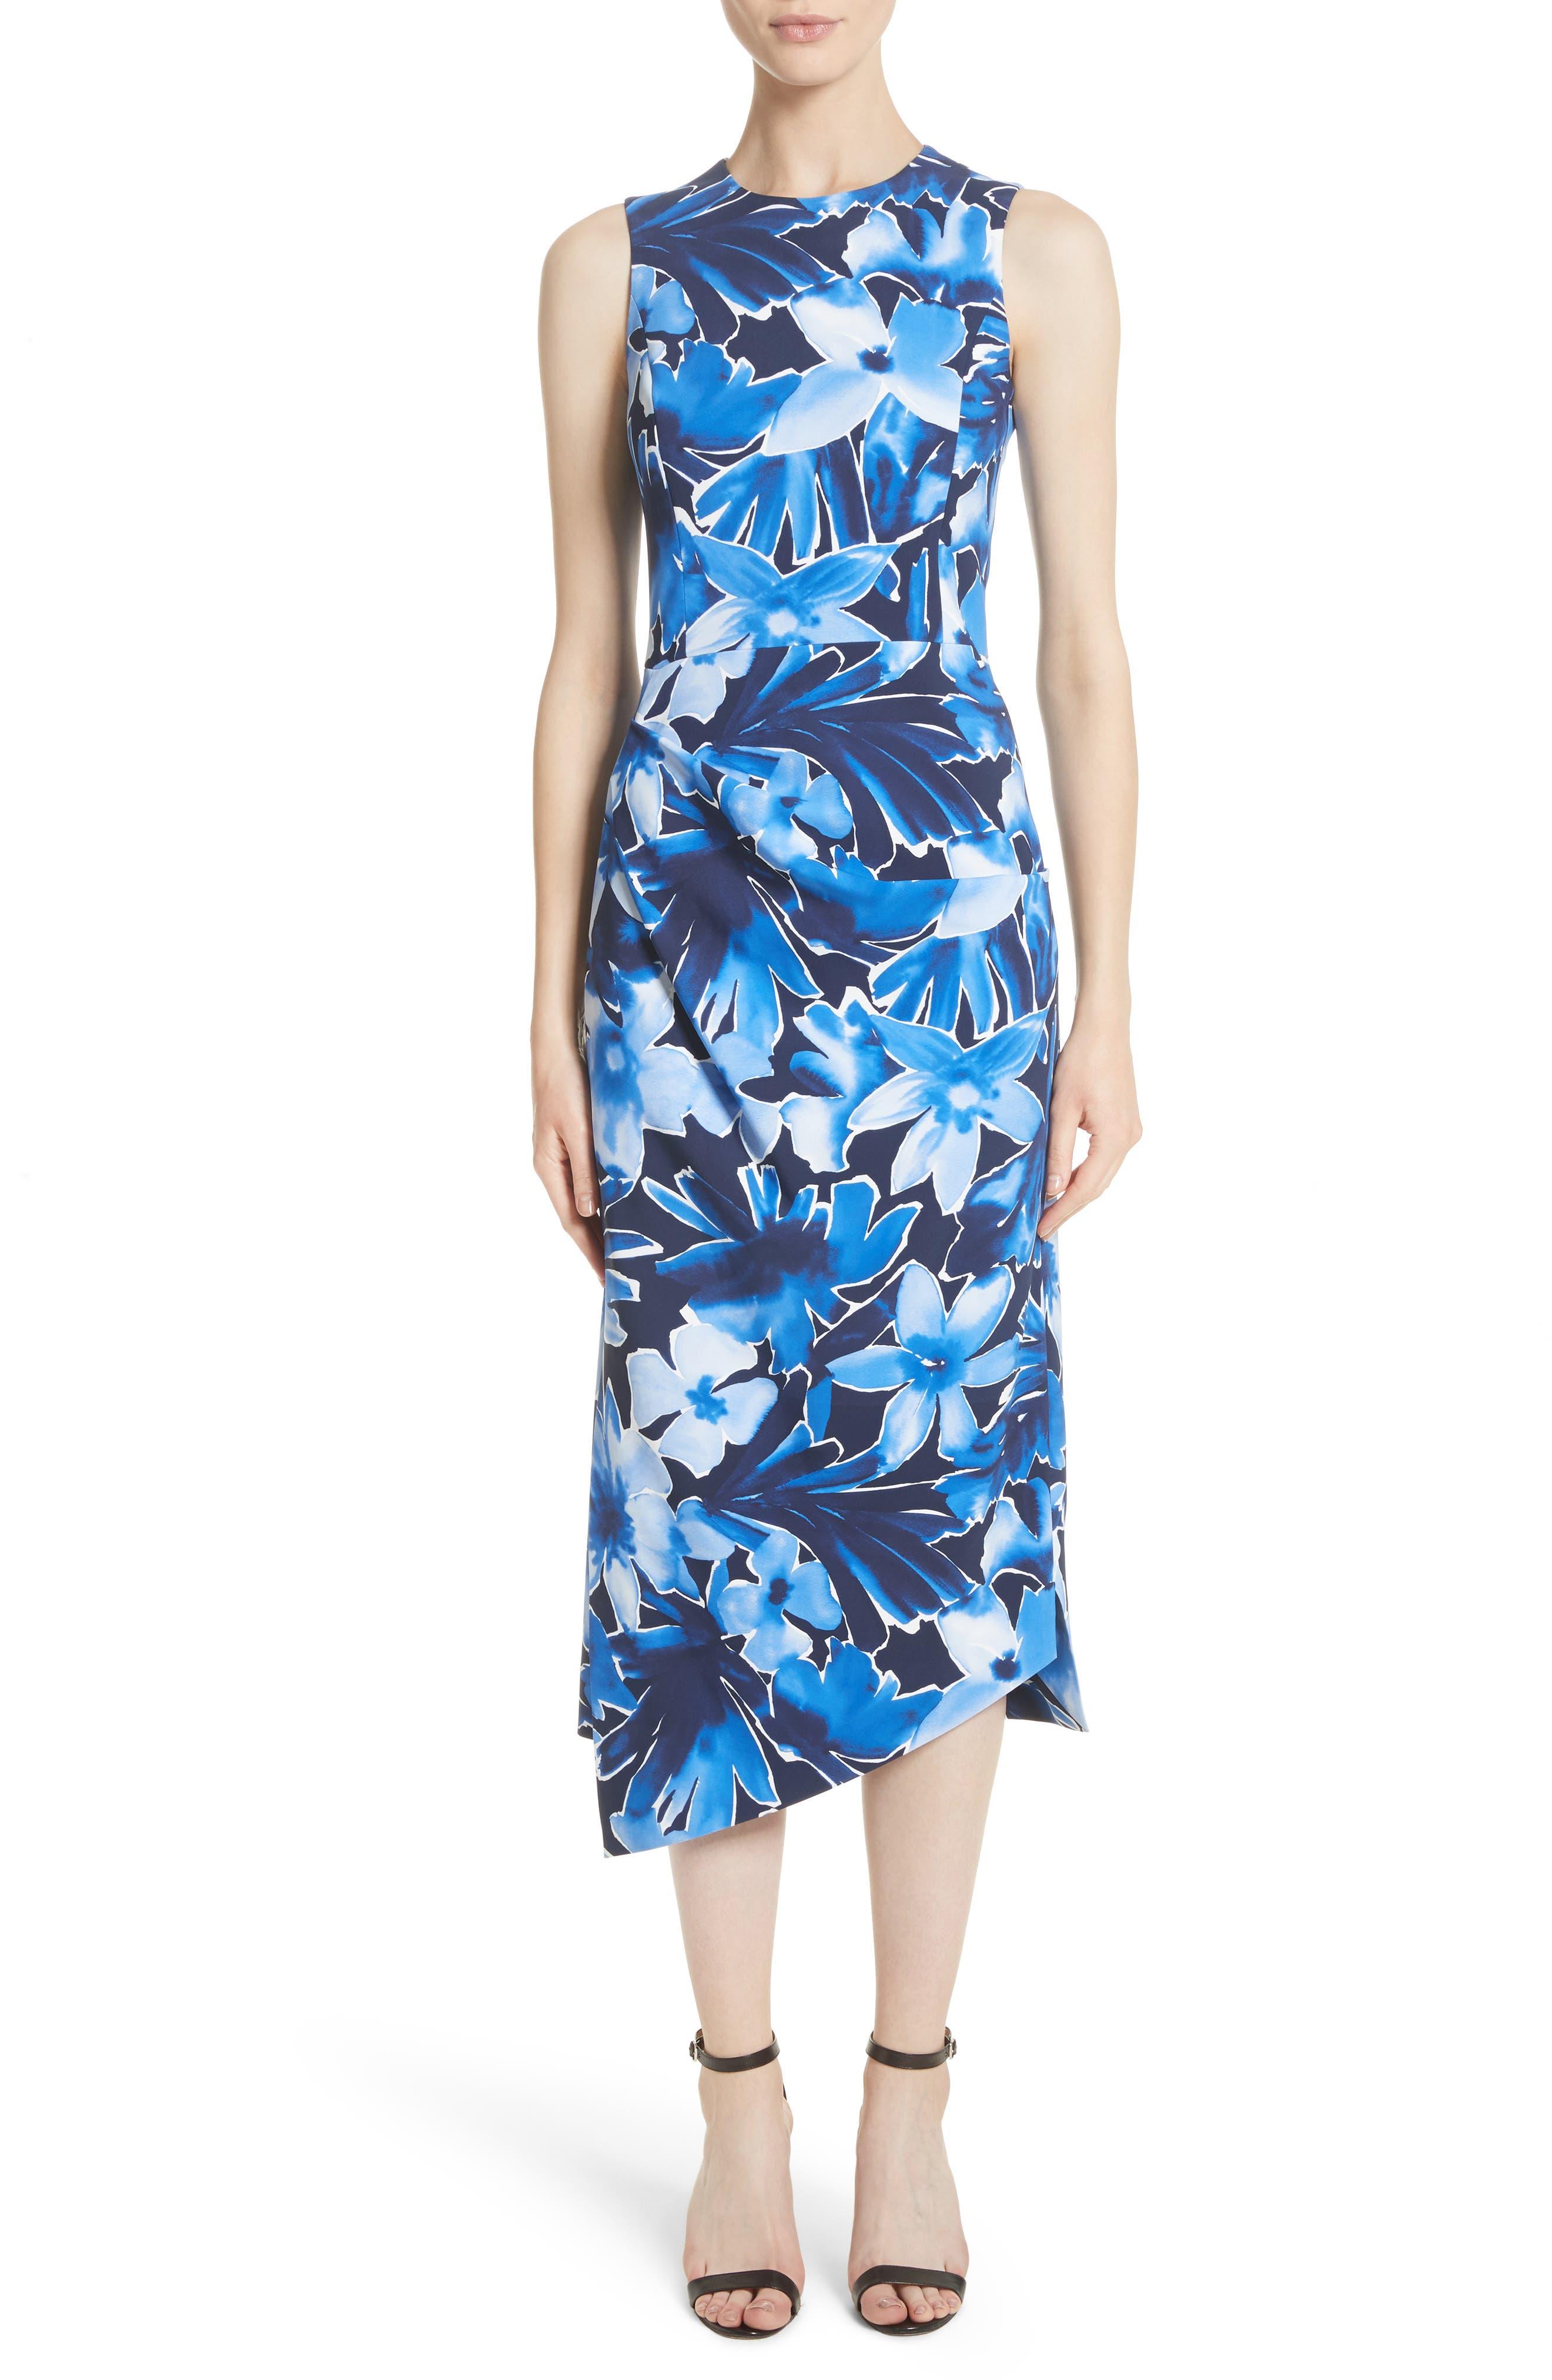 Alternate Image 1 Selected - Michael Kors Draped Floral Print Sheath Dress